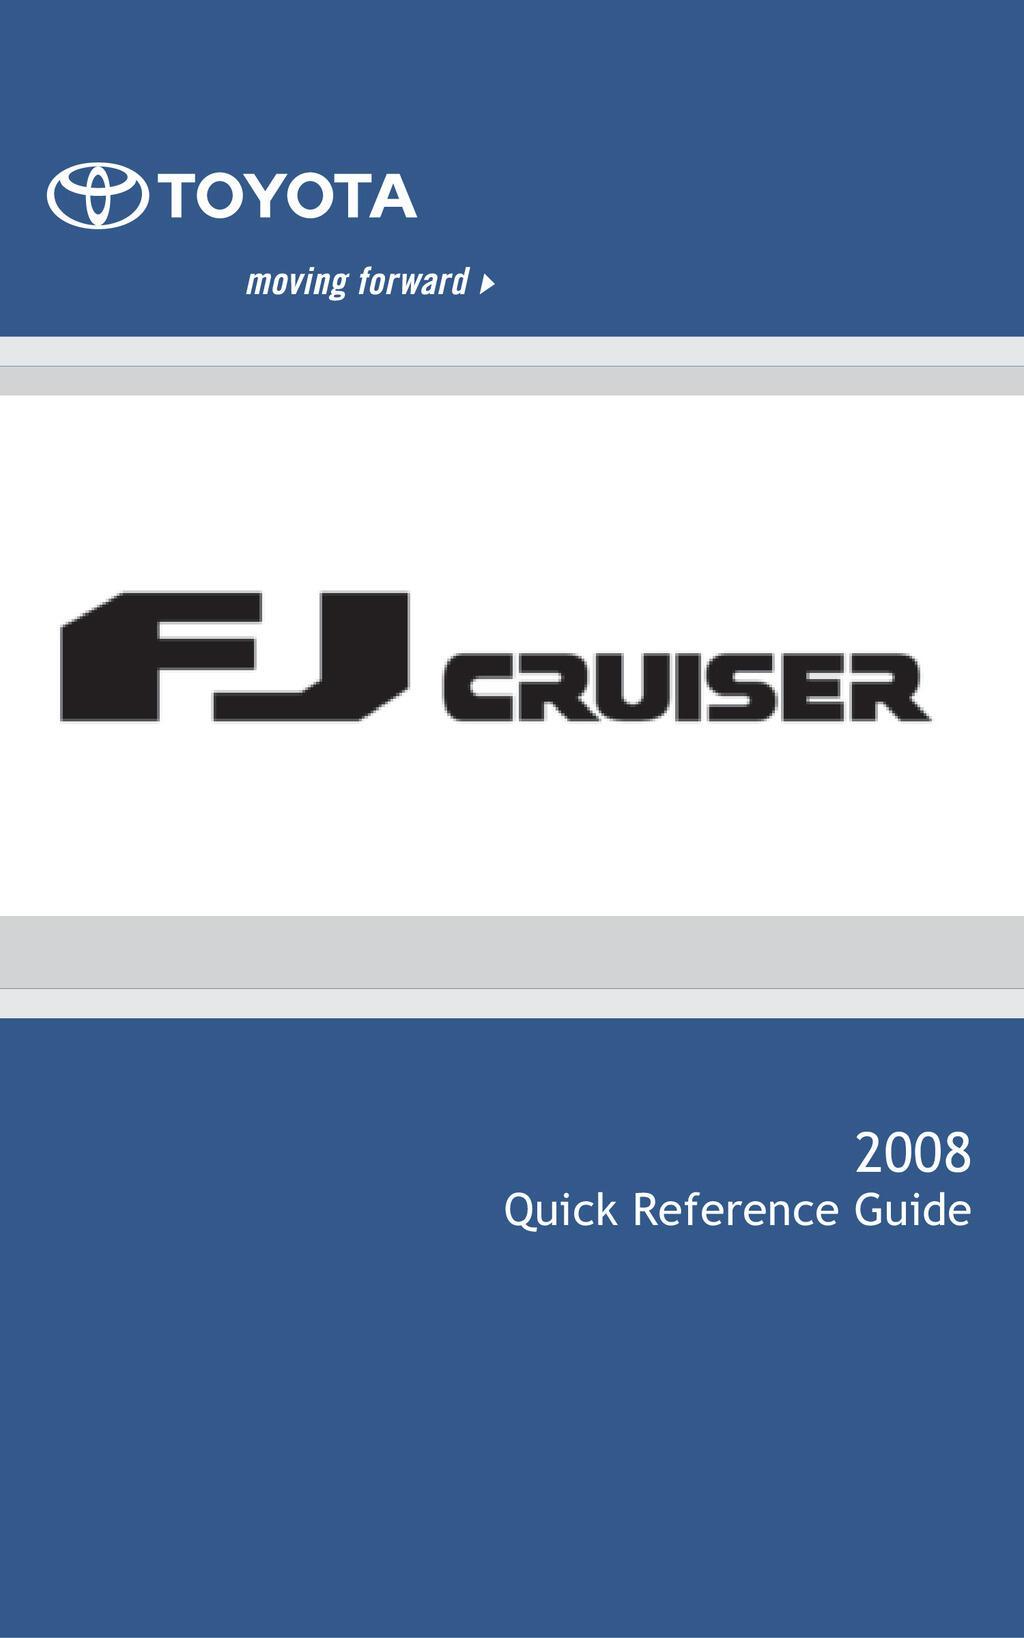 2008 Toyota Fj Cruiser owners manual